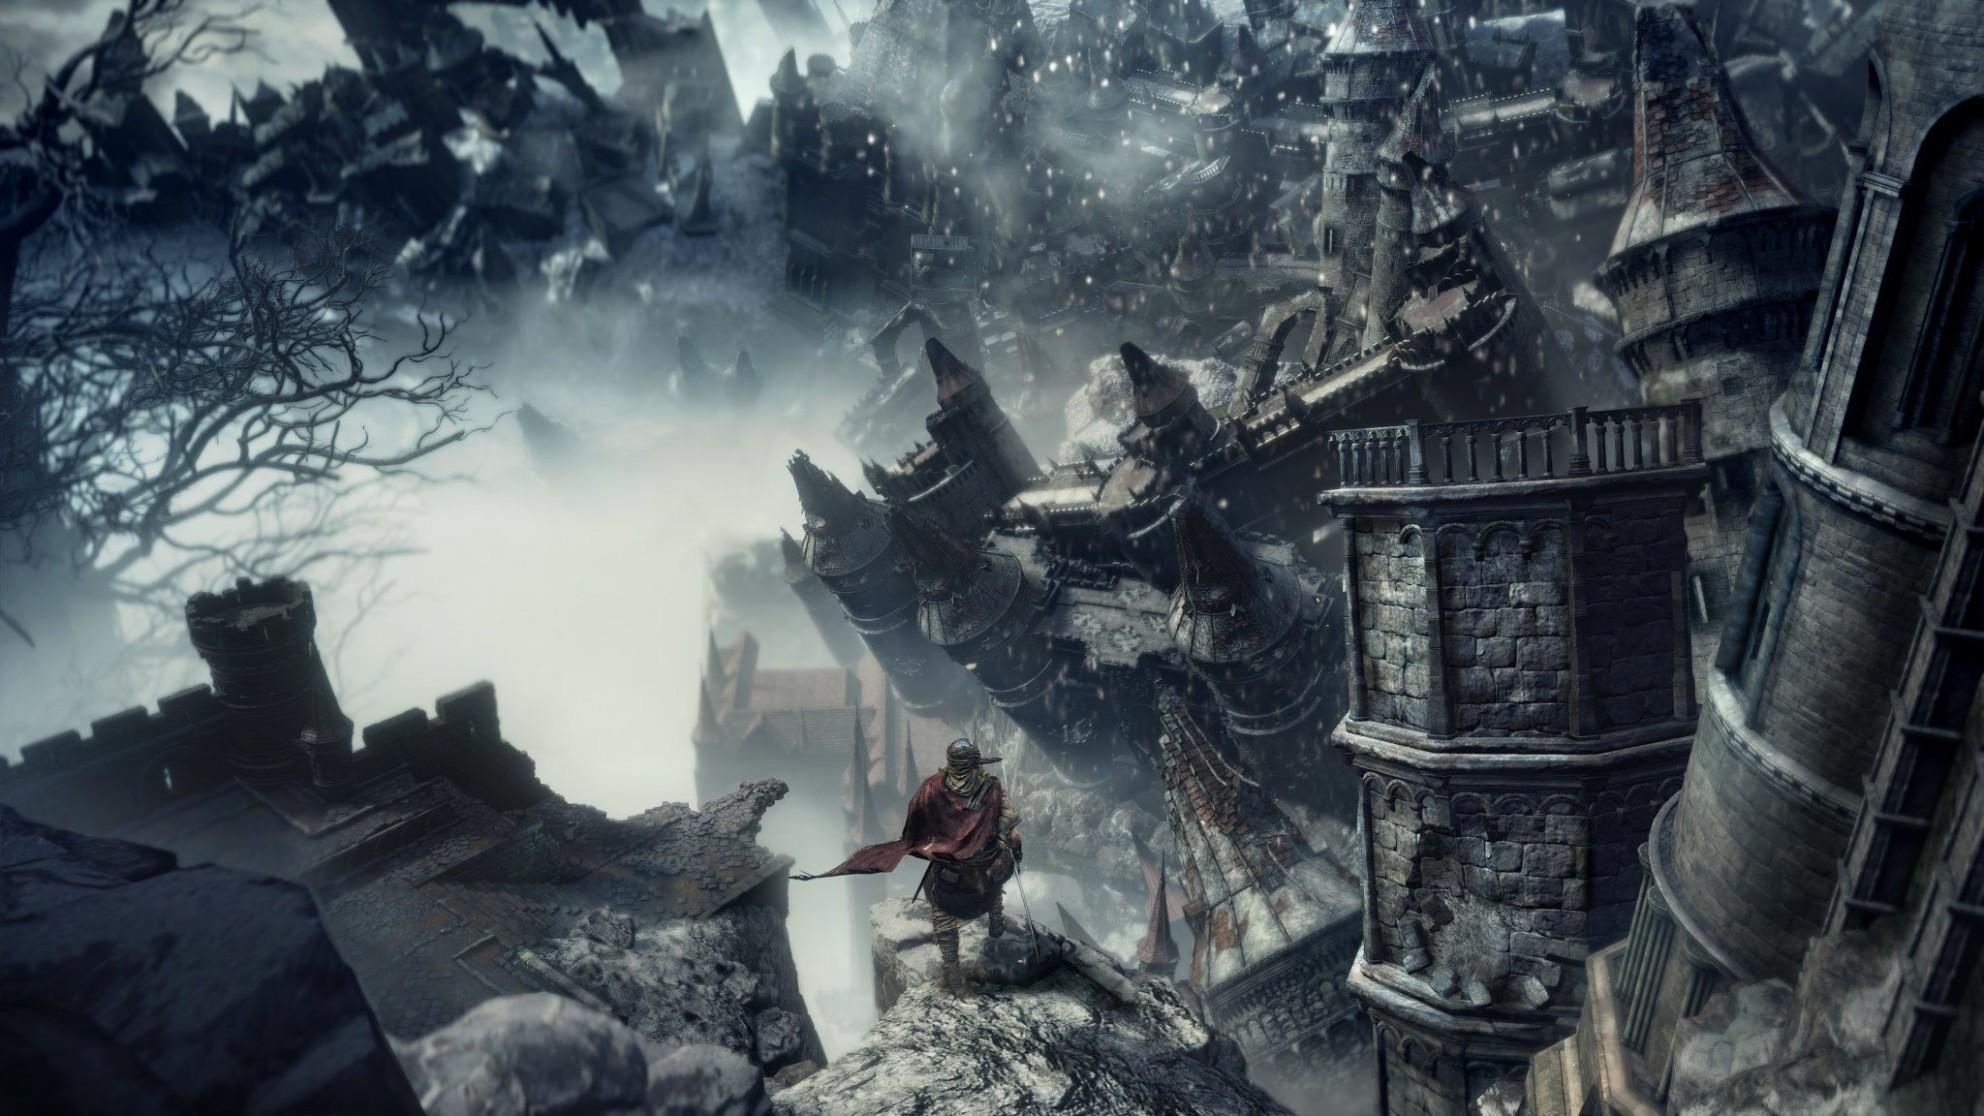 ᐈ Dark Souls 3 Dlc Ringed City Lapp Npc Locations Weplay